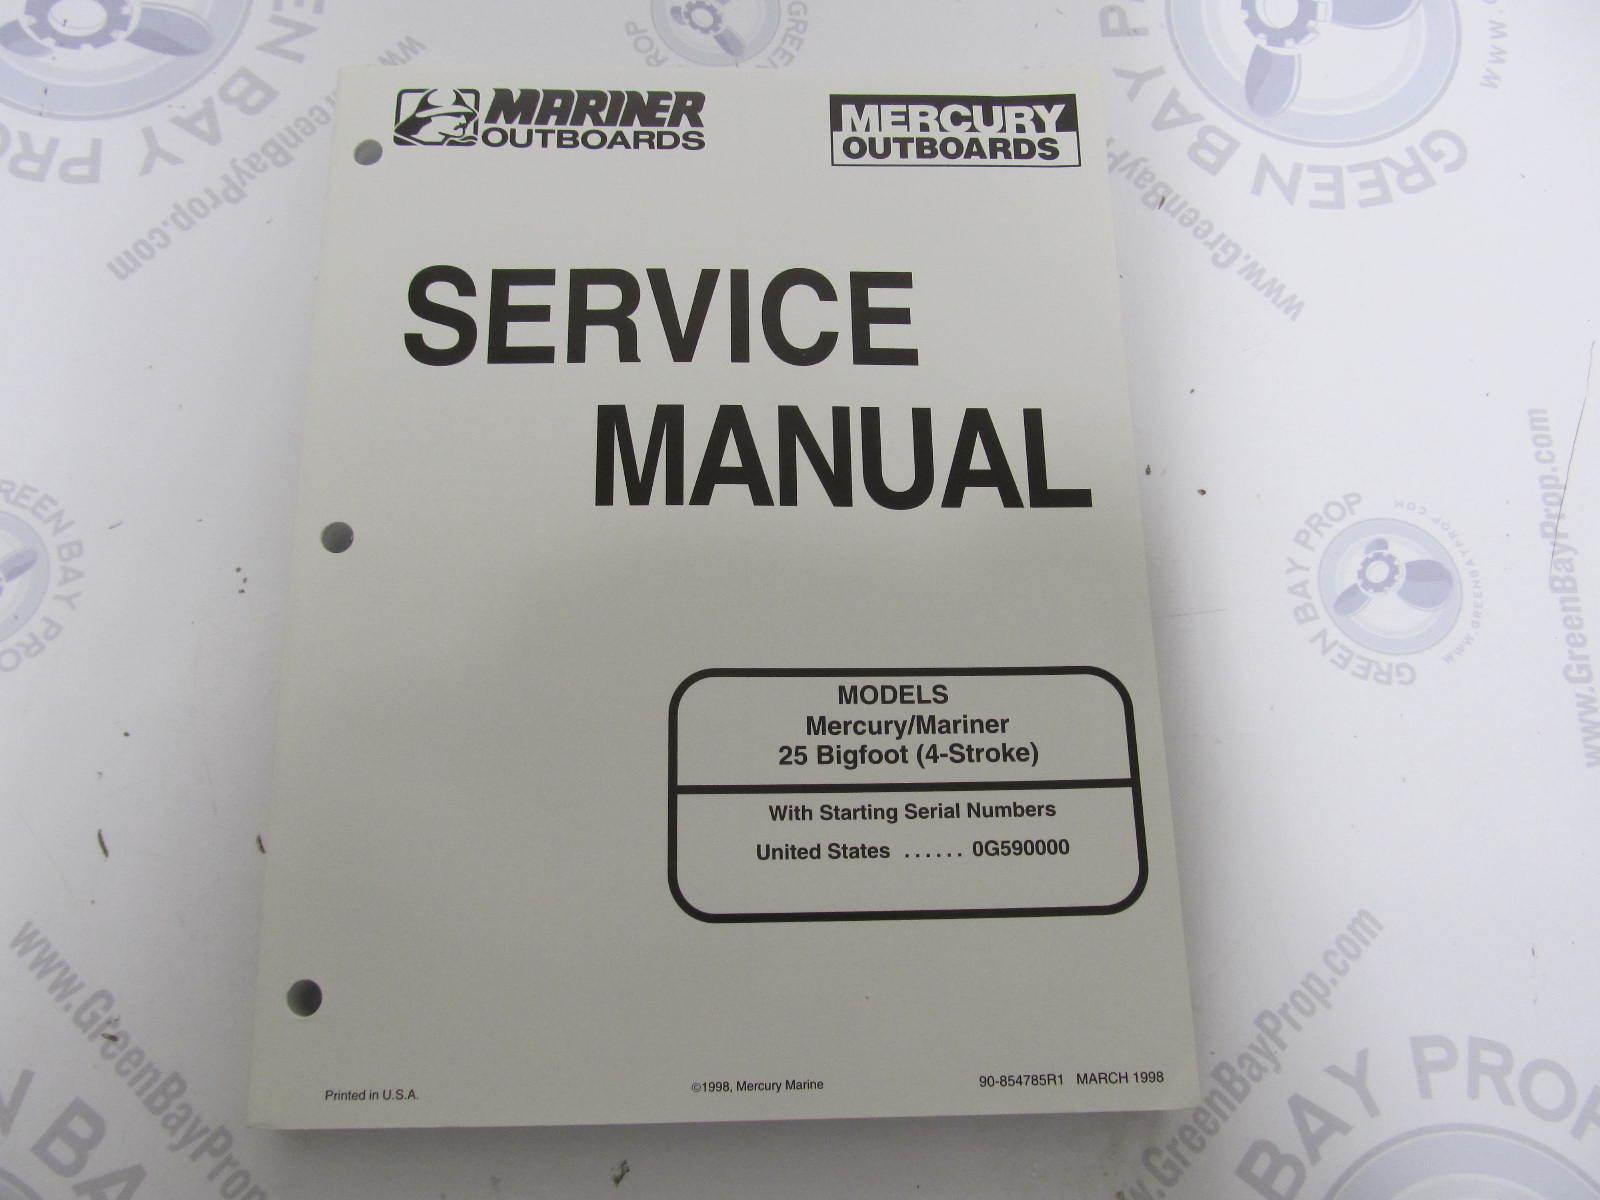 90-854785R1 1998 Mercury Mariner Outboard Service Manual 25 Bigfoot 4-Stroke  ...